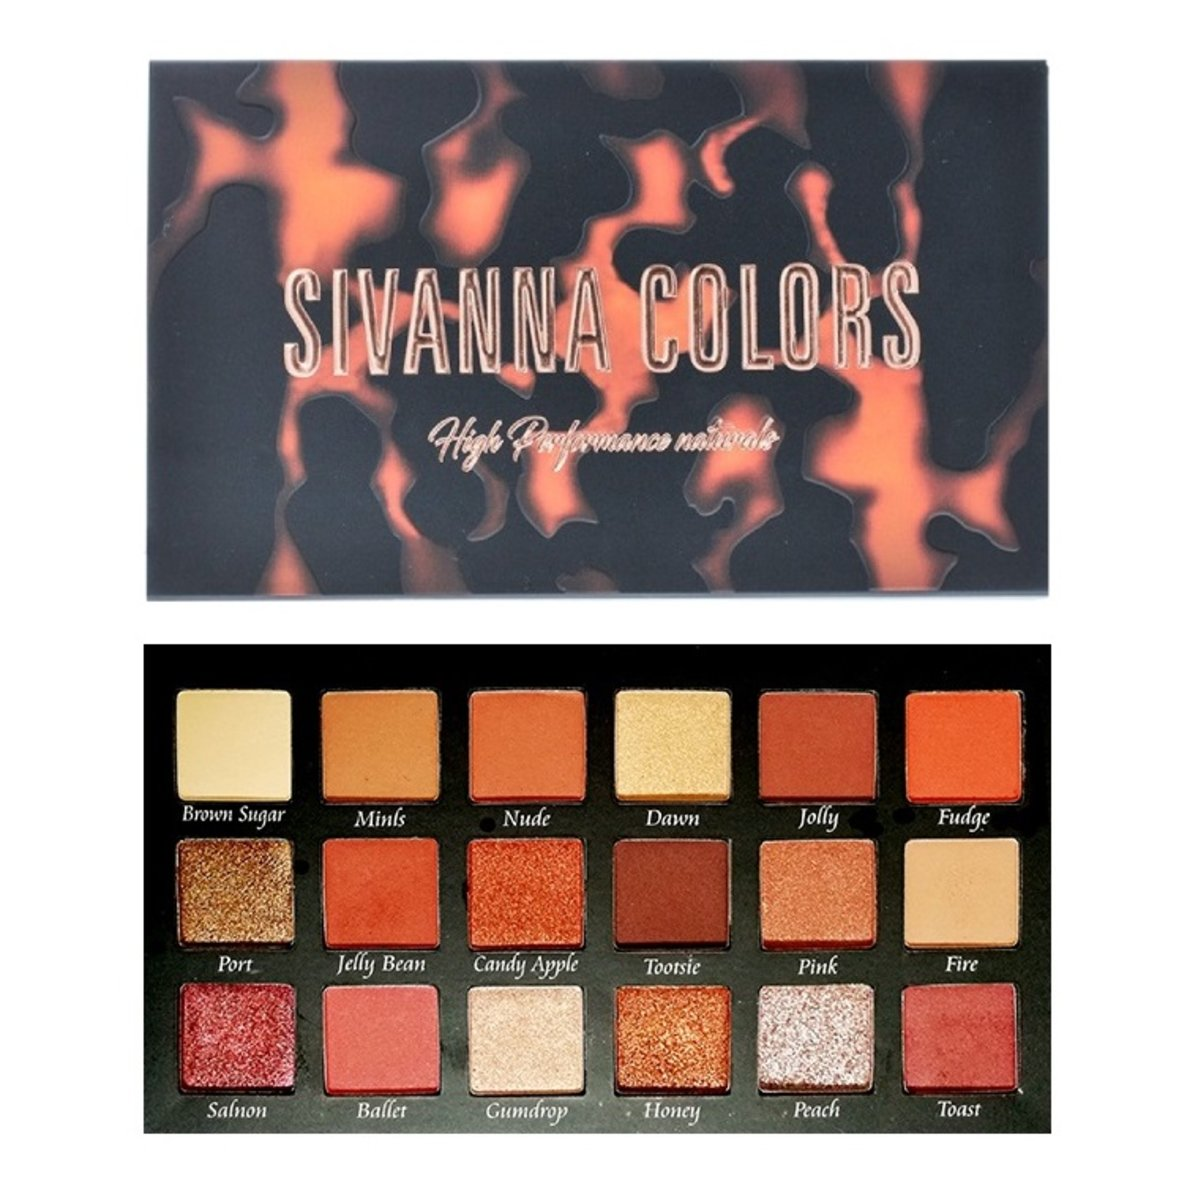 High Performance Natures 18 Eyeshadow Palette #02 Orange 18g (8858994440638)